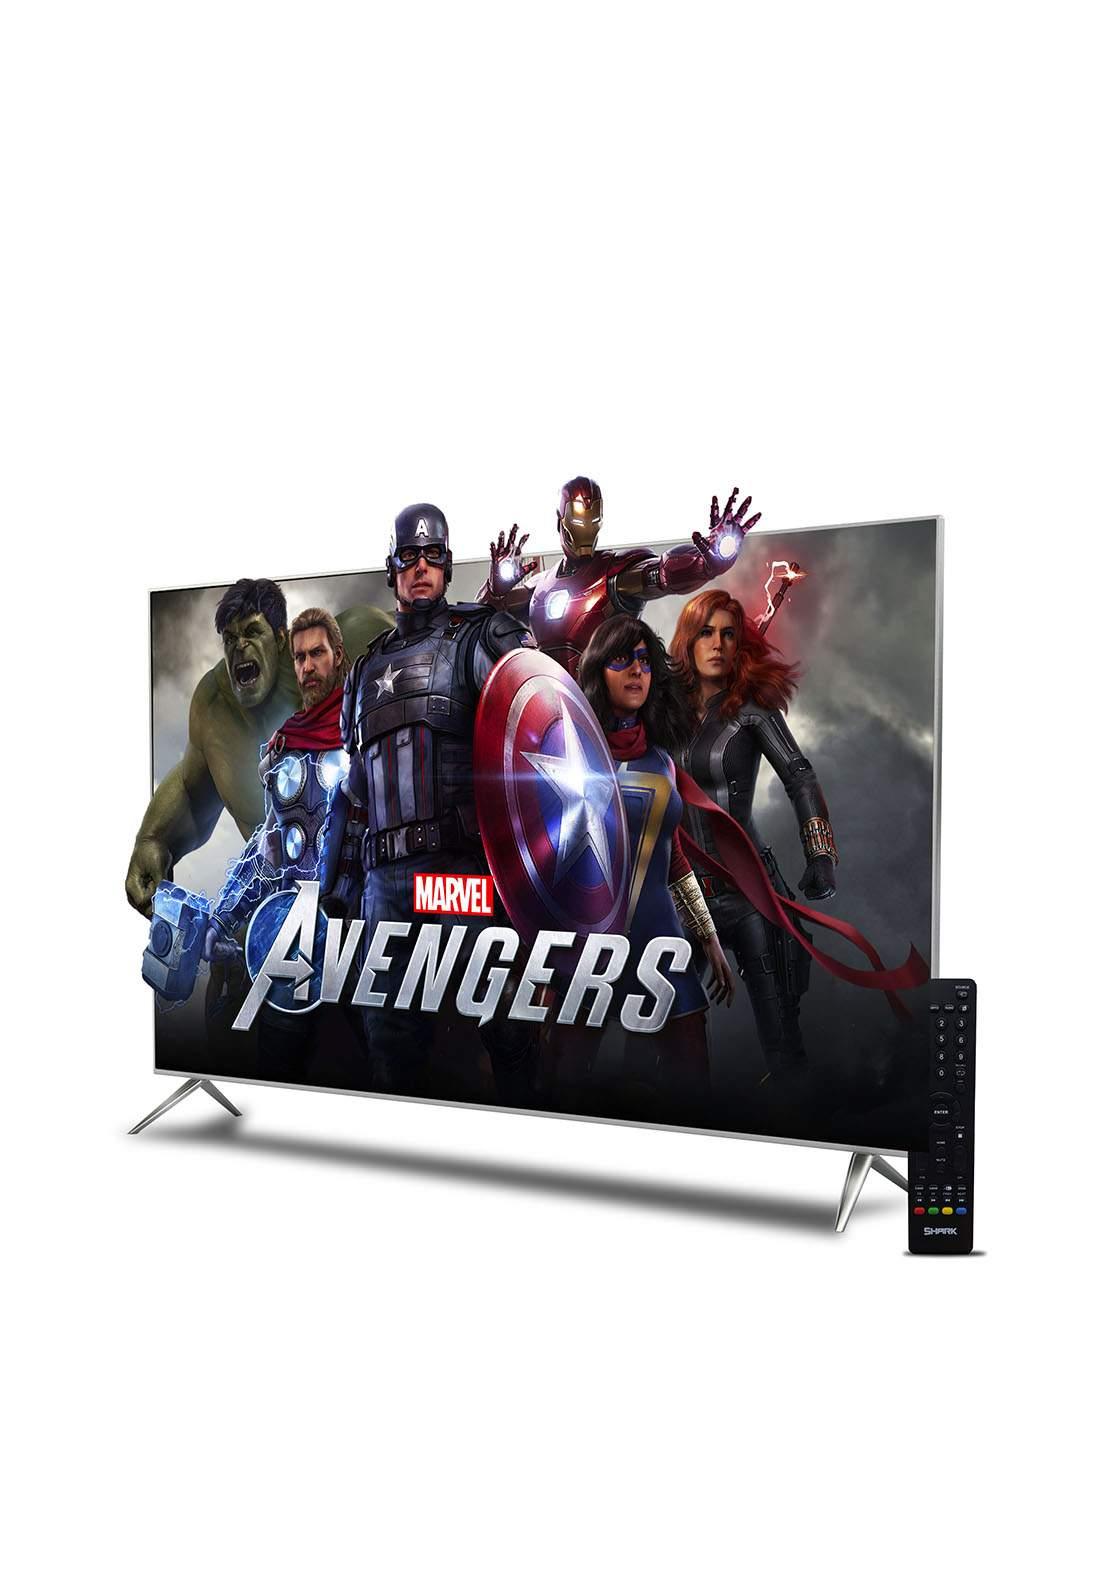 Shark Smart Led Tv - 45inch شاشة ذكية